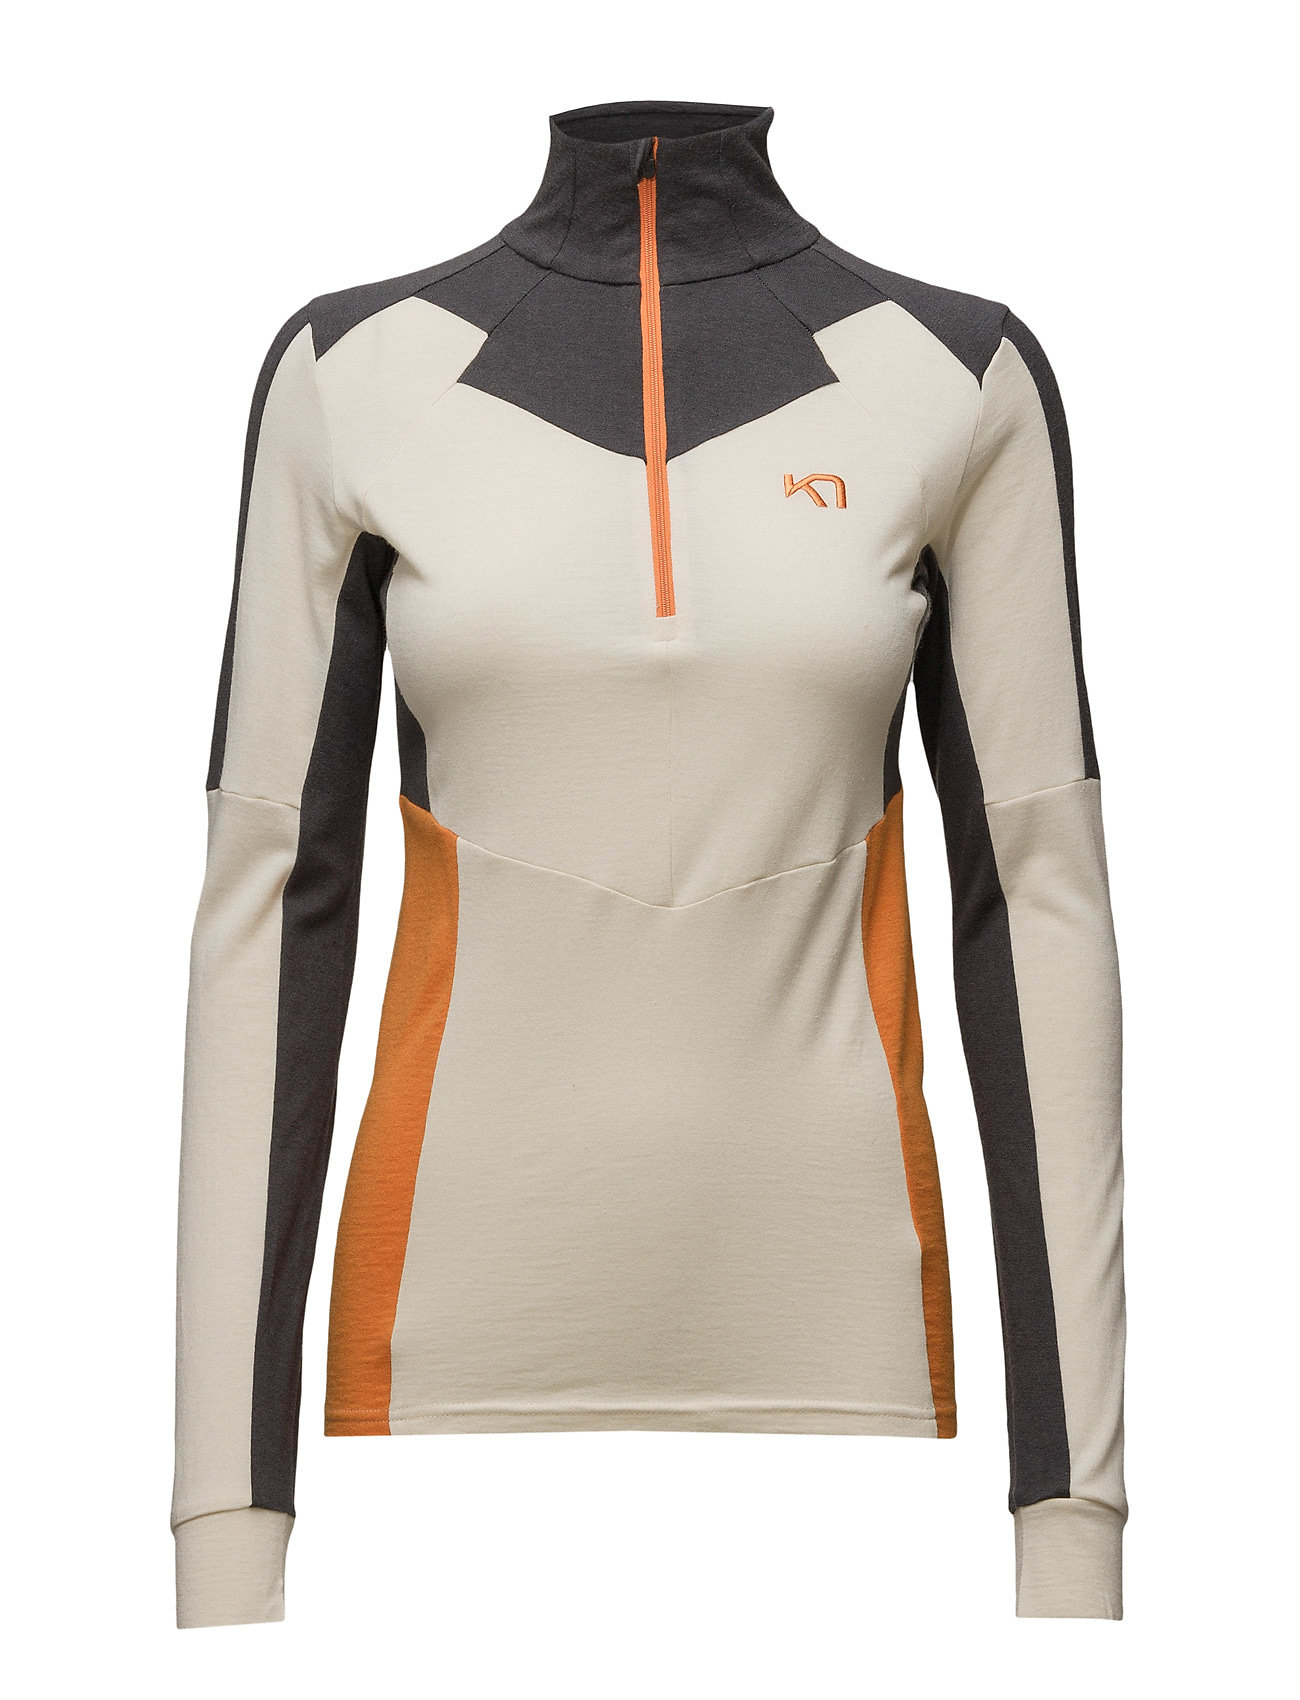 Voss Ls Kari Traa Sports undertøj til Kvinder i